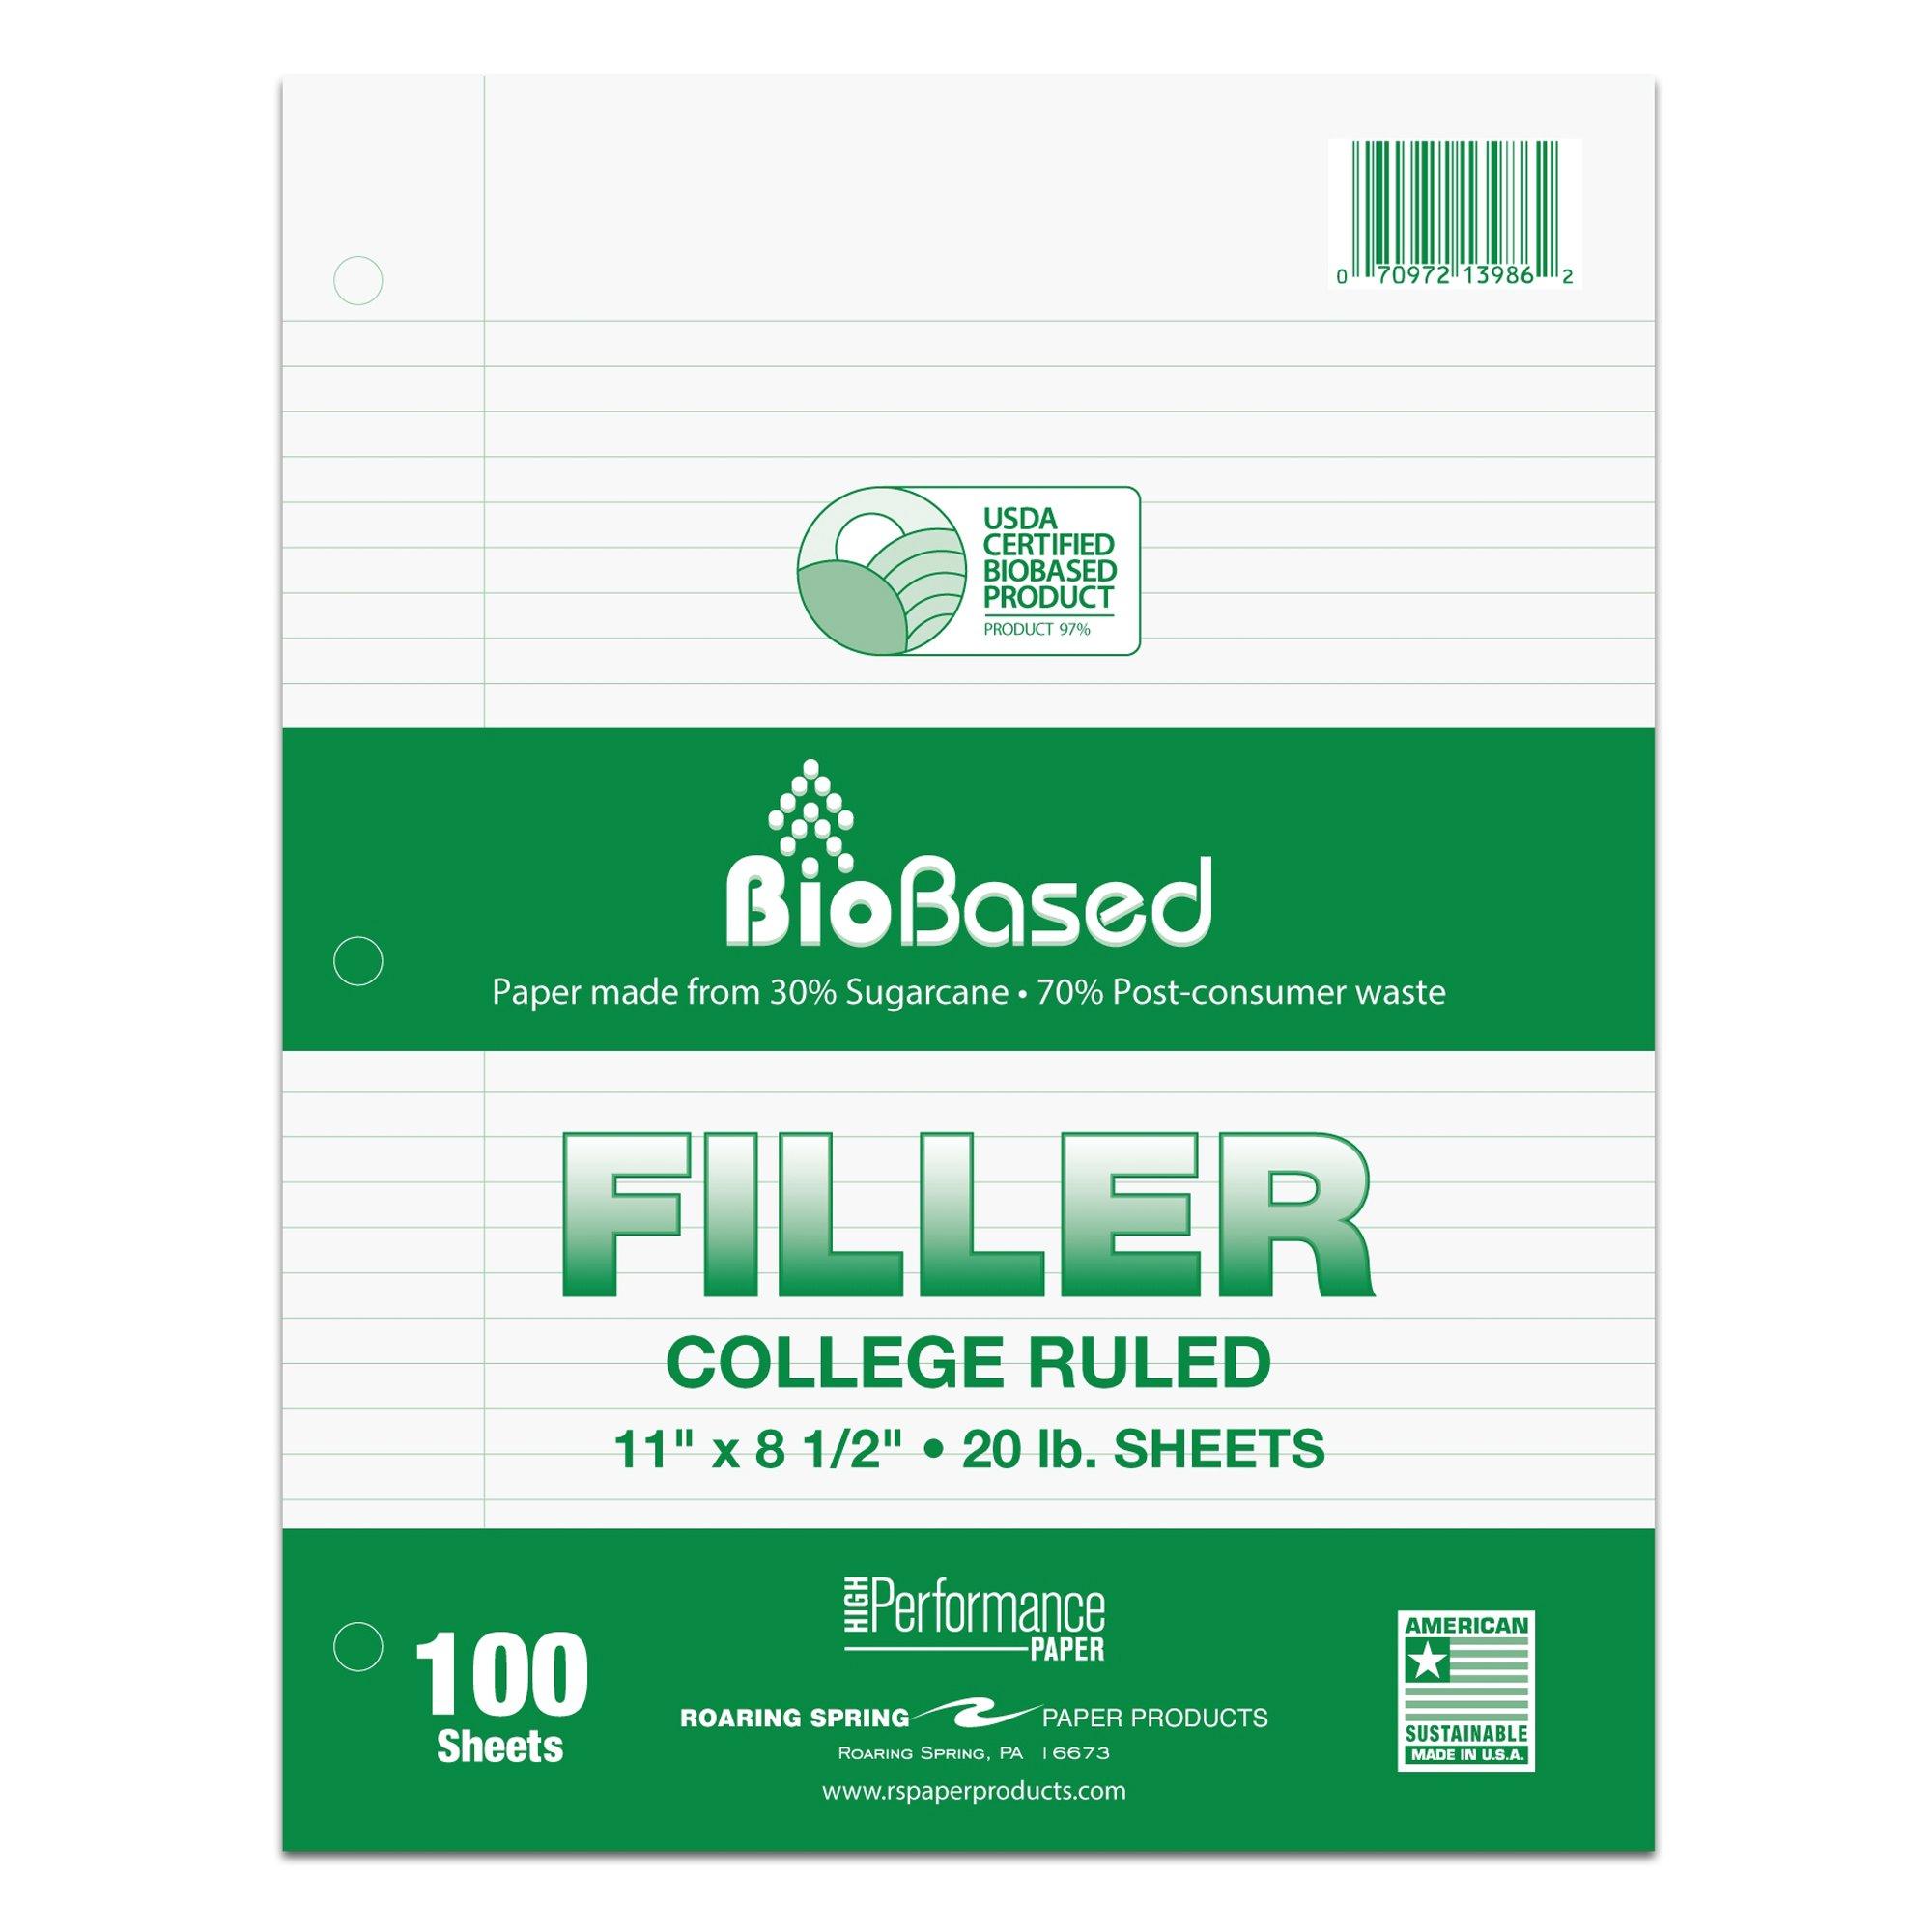 "Roaring Spring Filler Paper, College Ruled, 11"" x 8.5"", 20# BioBase Paper"